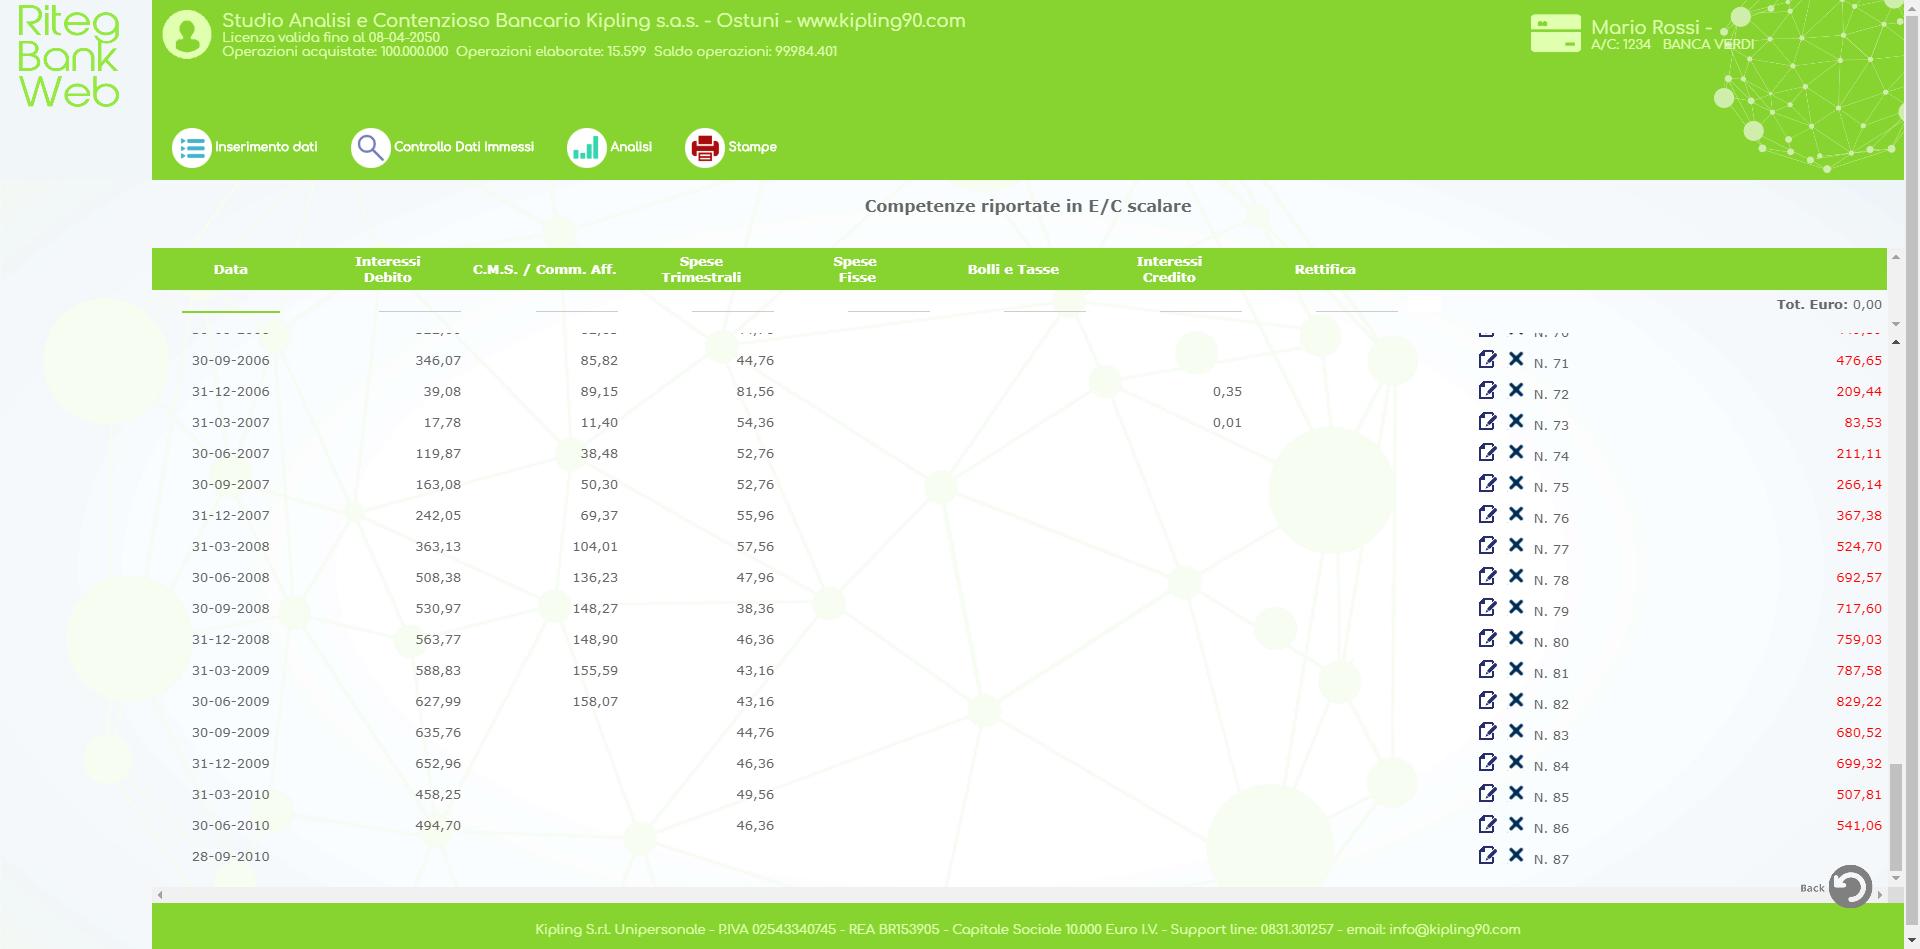 Riteg Bank Web - Inserimento competenze